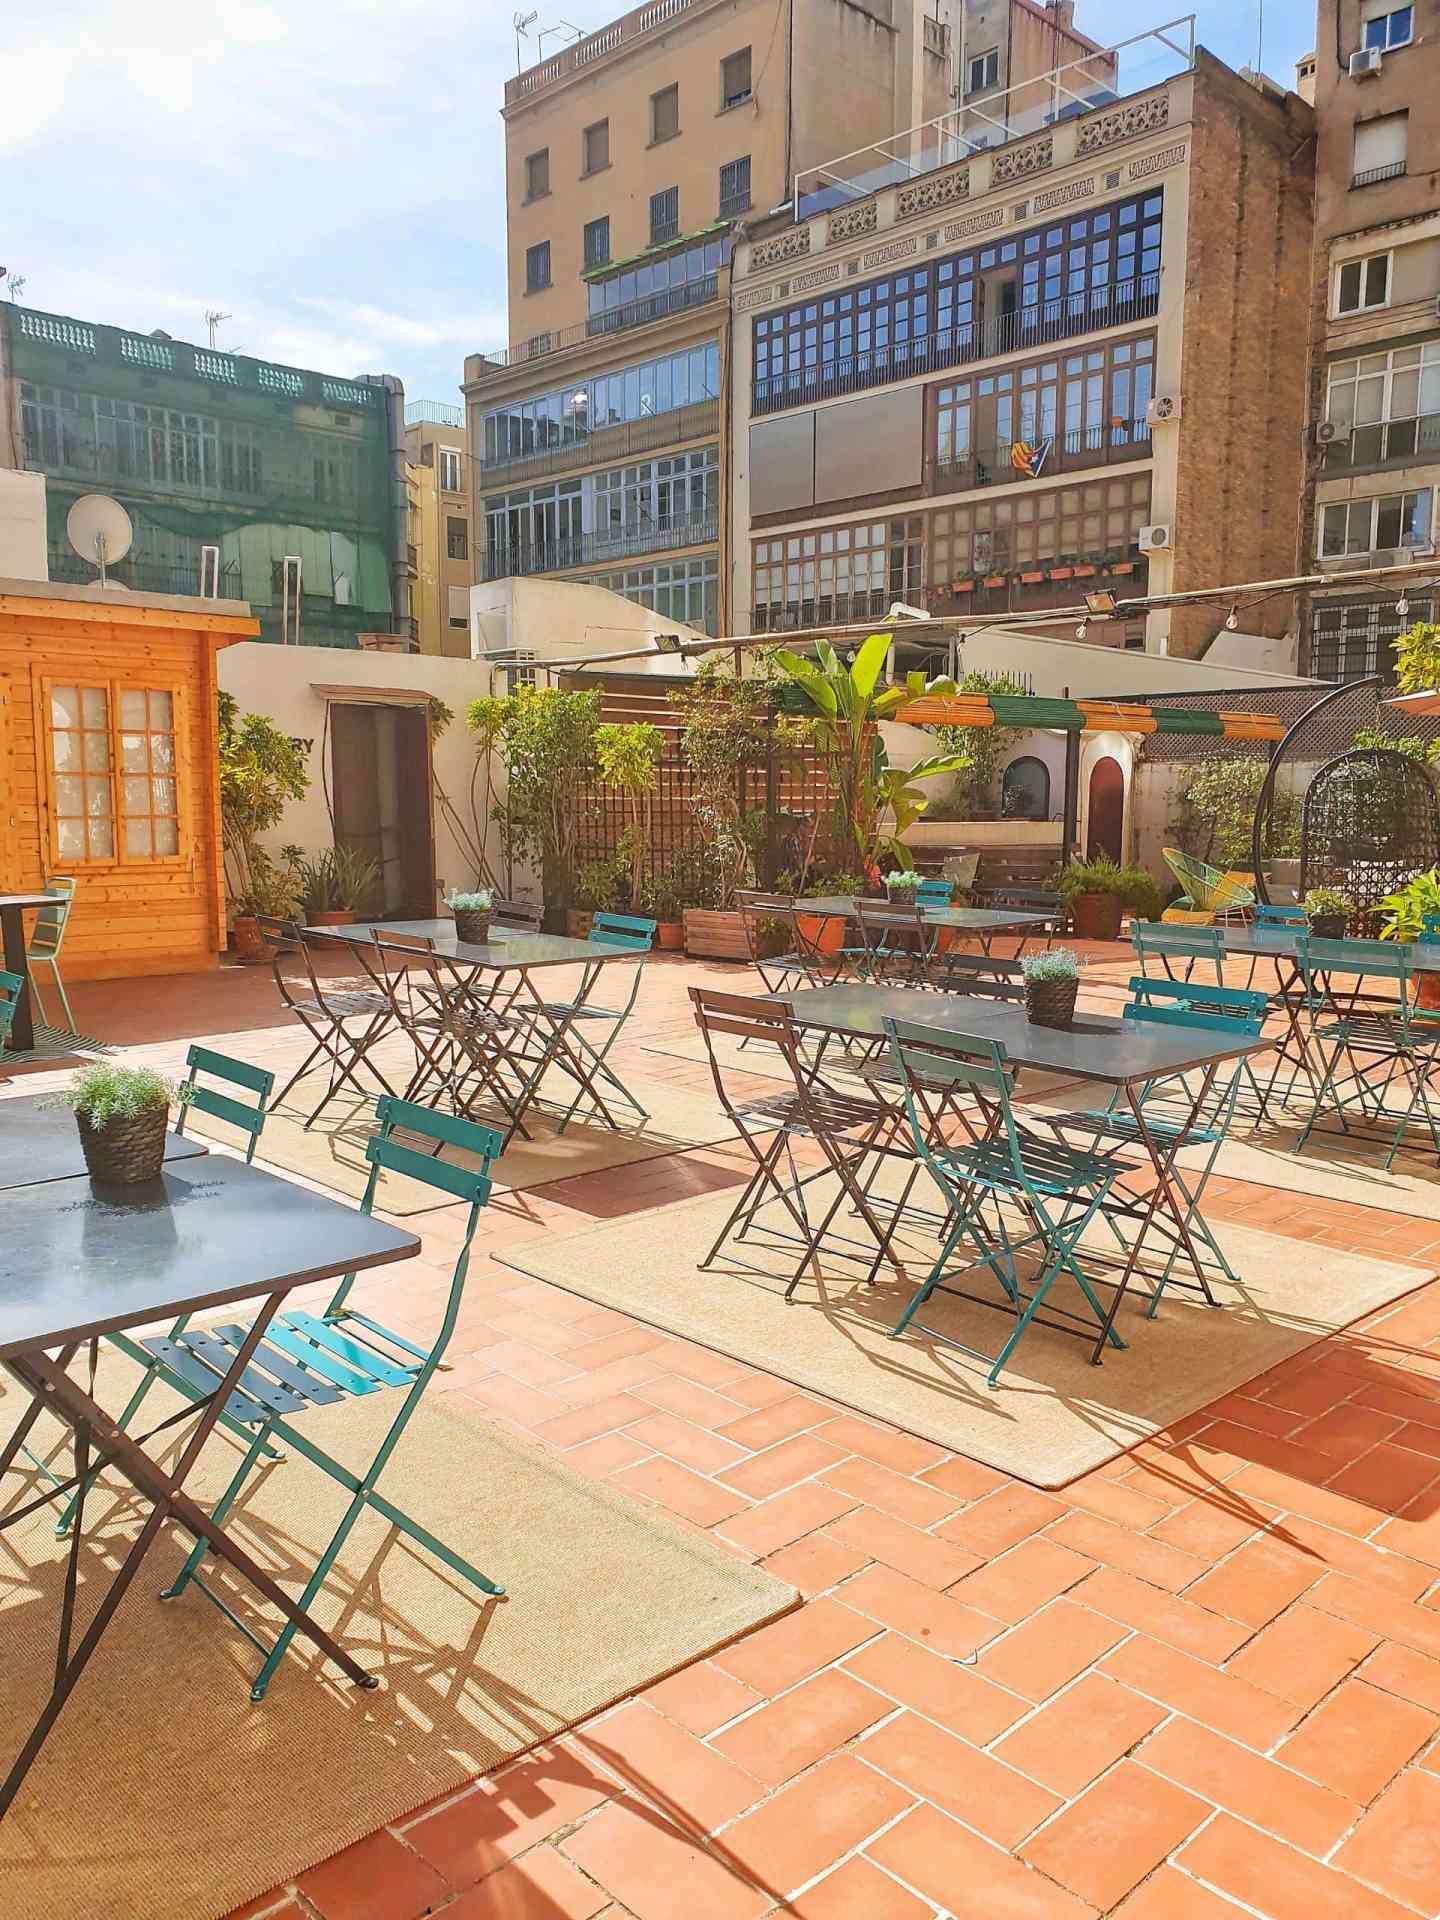 Rodamon Barcelona Hostel Review | Where To Stay In Barcelona